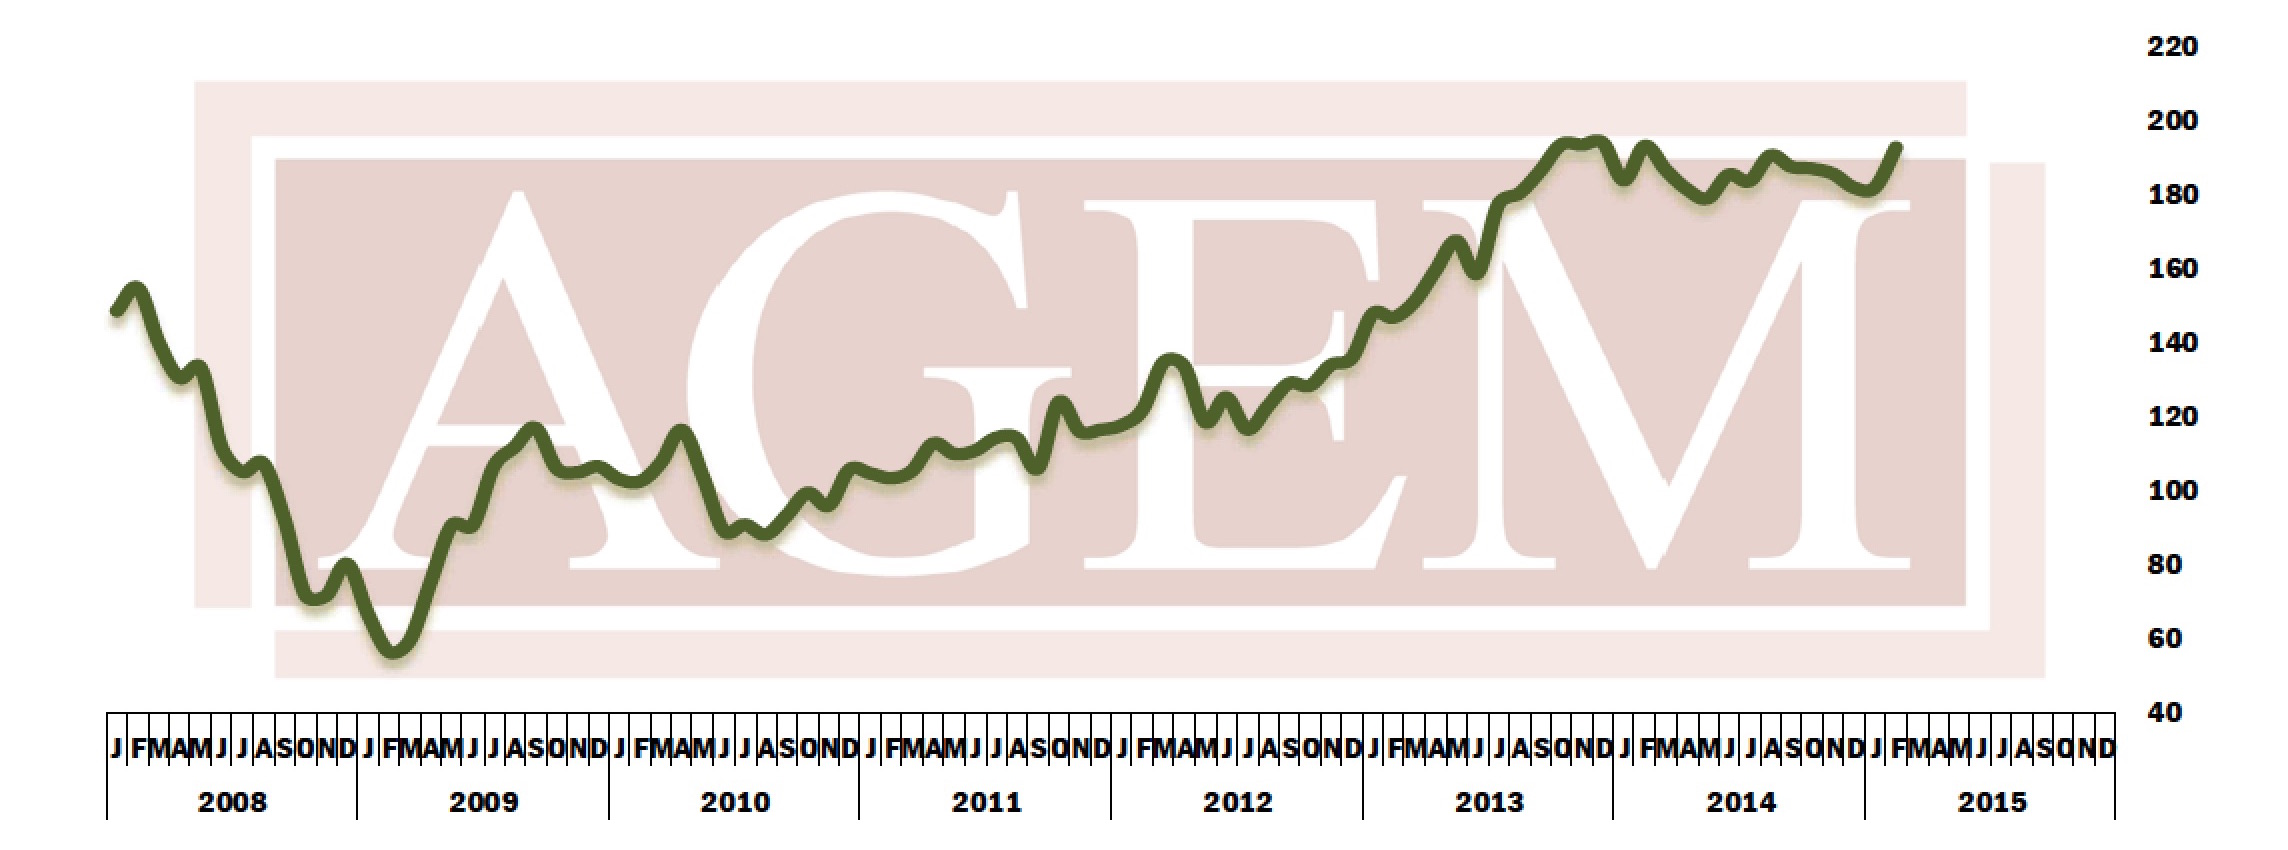 Agem index, February, 2015